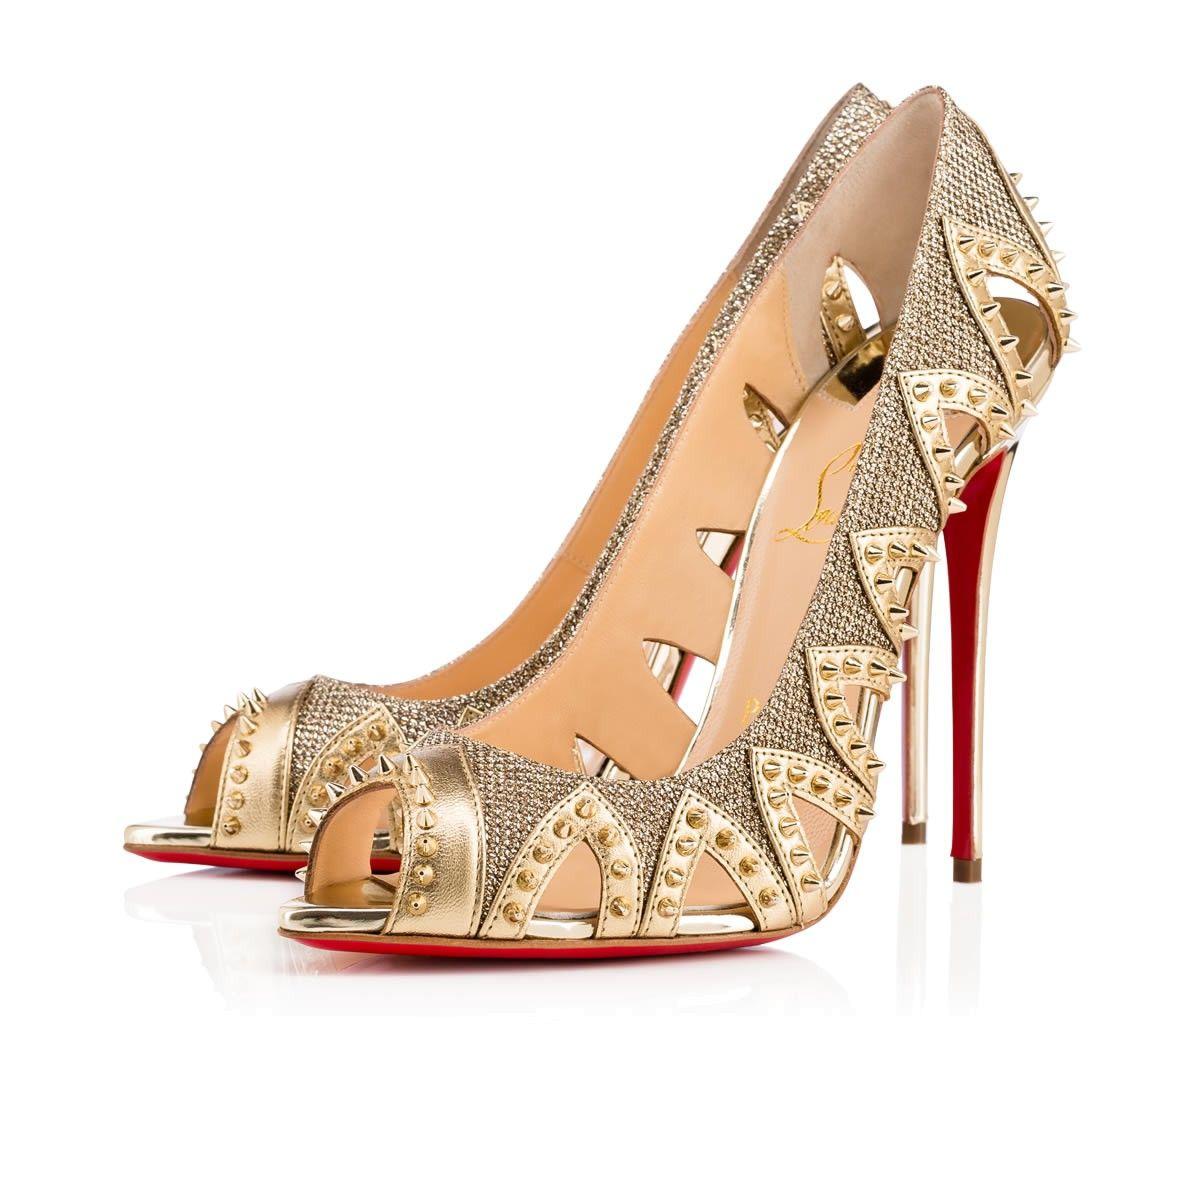 new product db01c 69e57 Christian louboutin circus city - glitter gold,christian ...